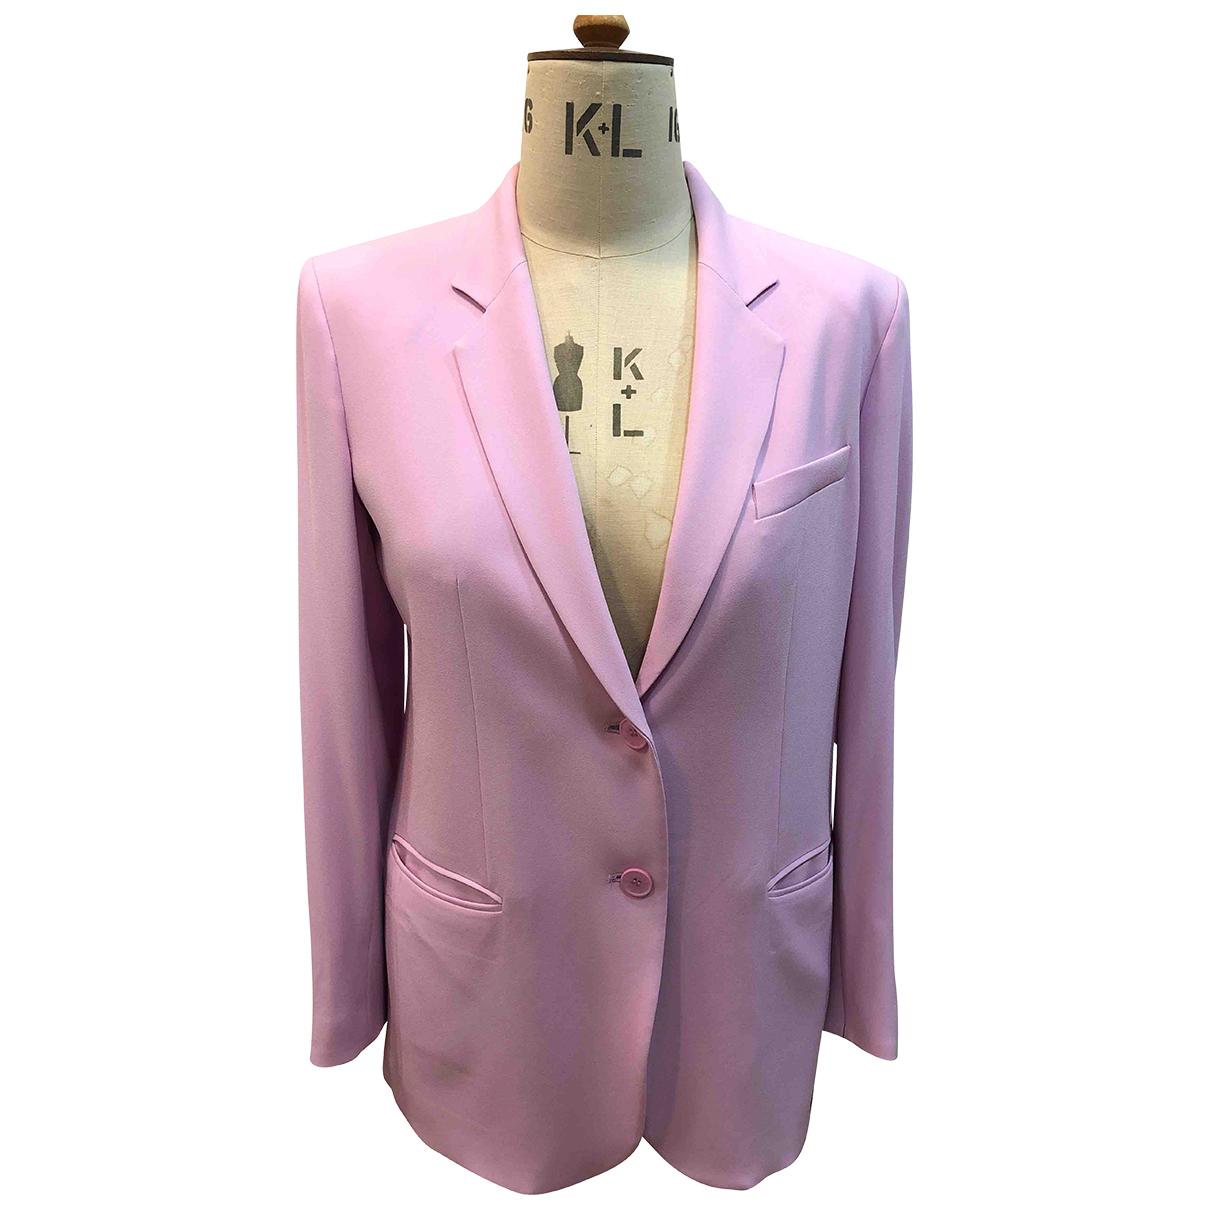 Dkny - Veste   pour femme - rose